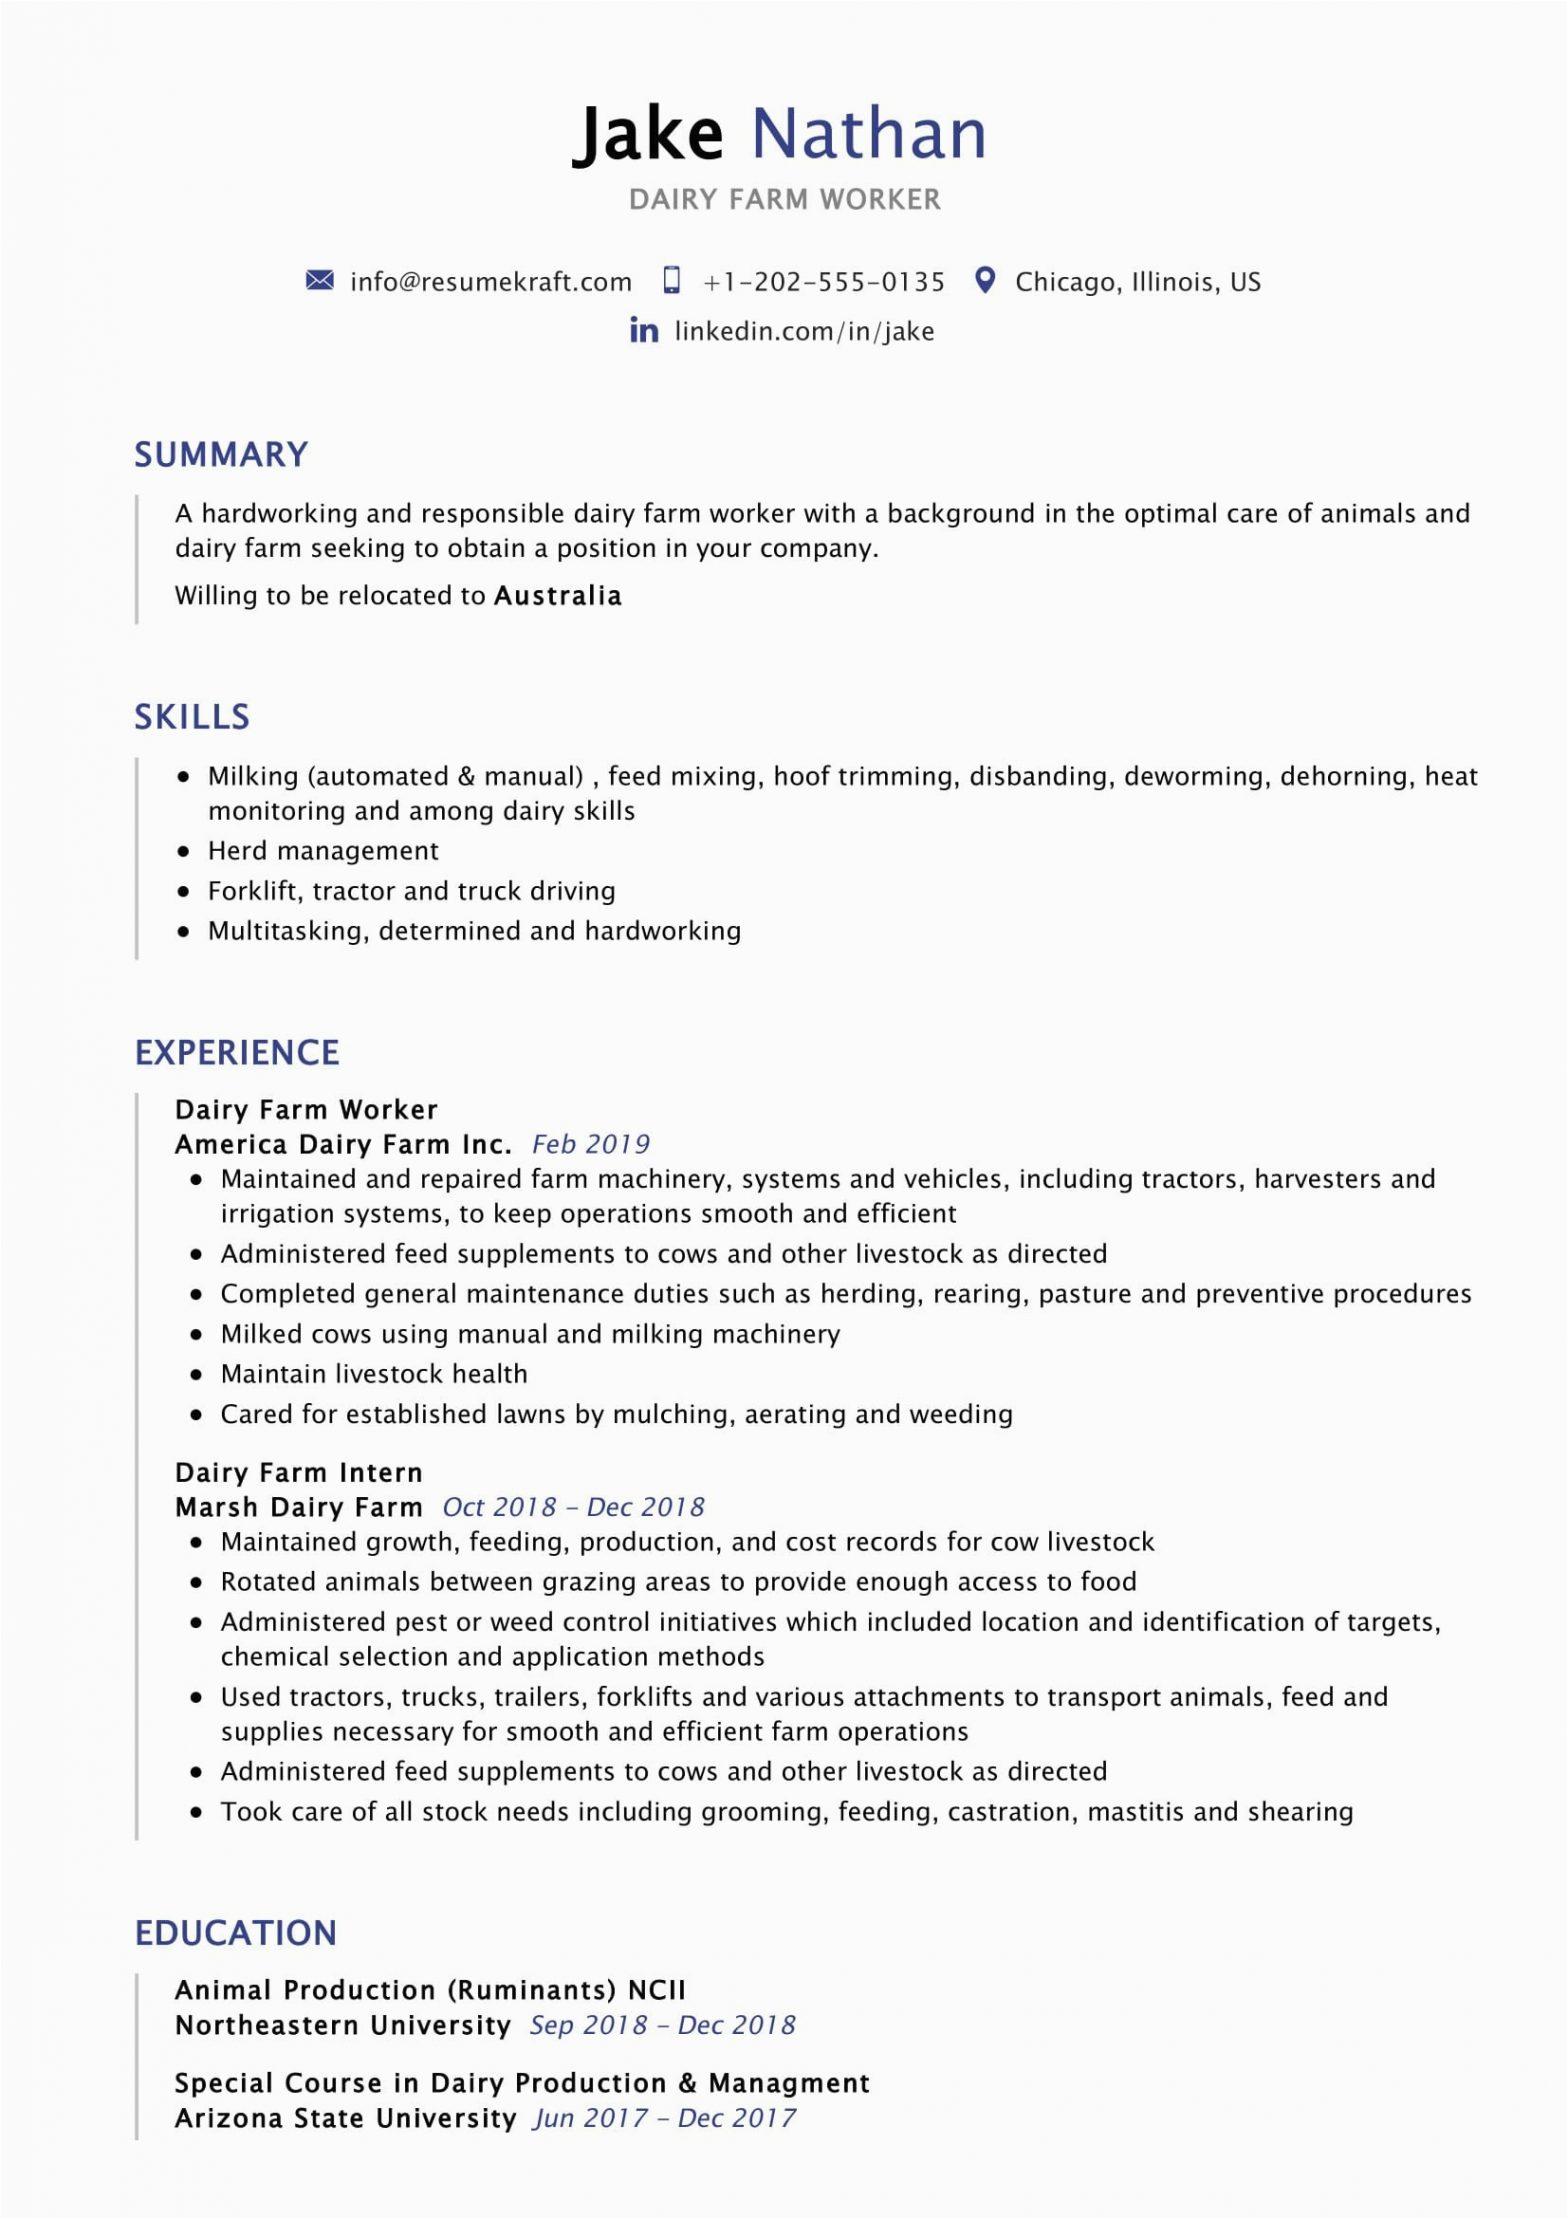 Sample Resume for Dairy Farm Worker Dairy Farm Worker Resume Sample 2021